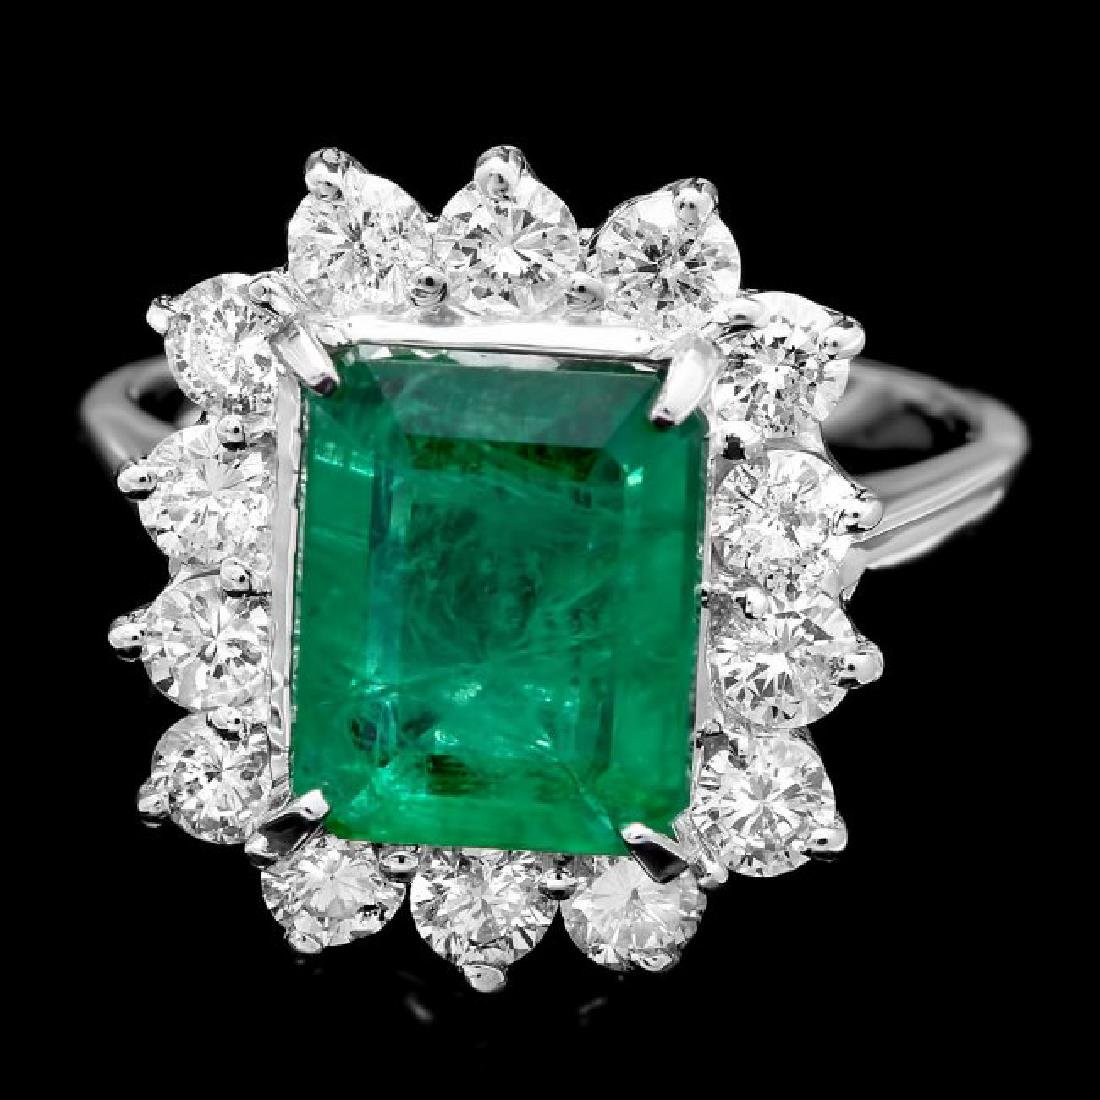 14k White Gold 3.13ct Emerald 1.35ct Diamond Ring